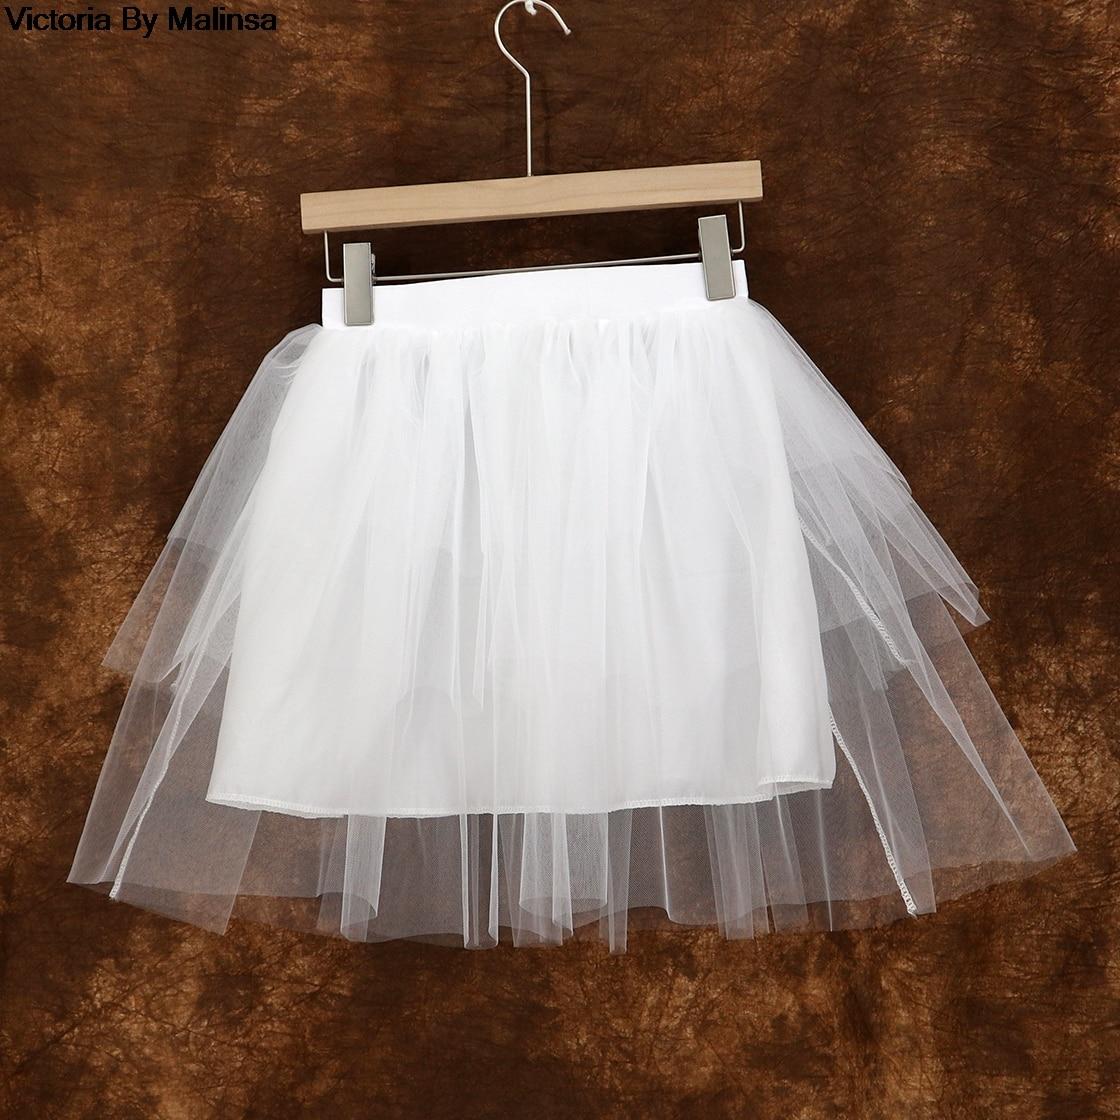 Image 4 - تنورة صغيرة من التول باللون الأبيض للنساء ، تنورة قصيرة منتفخة من قماش التول ، تنورة قصيرة منتفخة من قماش التتوتو مصنوعة حسب الطلب-في تنانير من ملابس نسائية على AliExpress